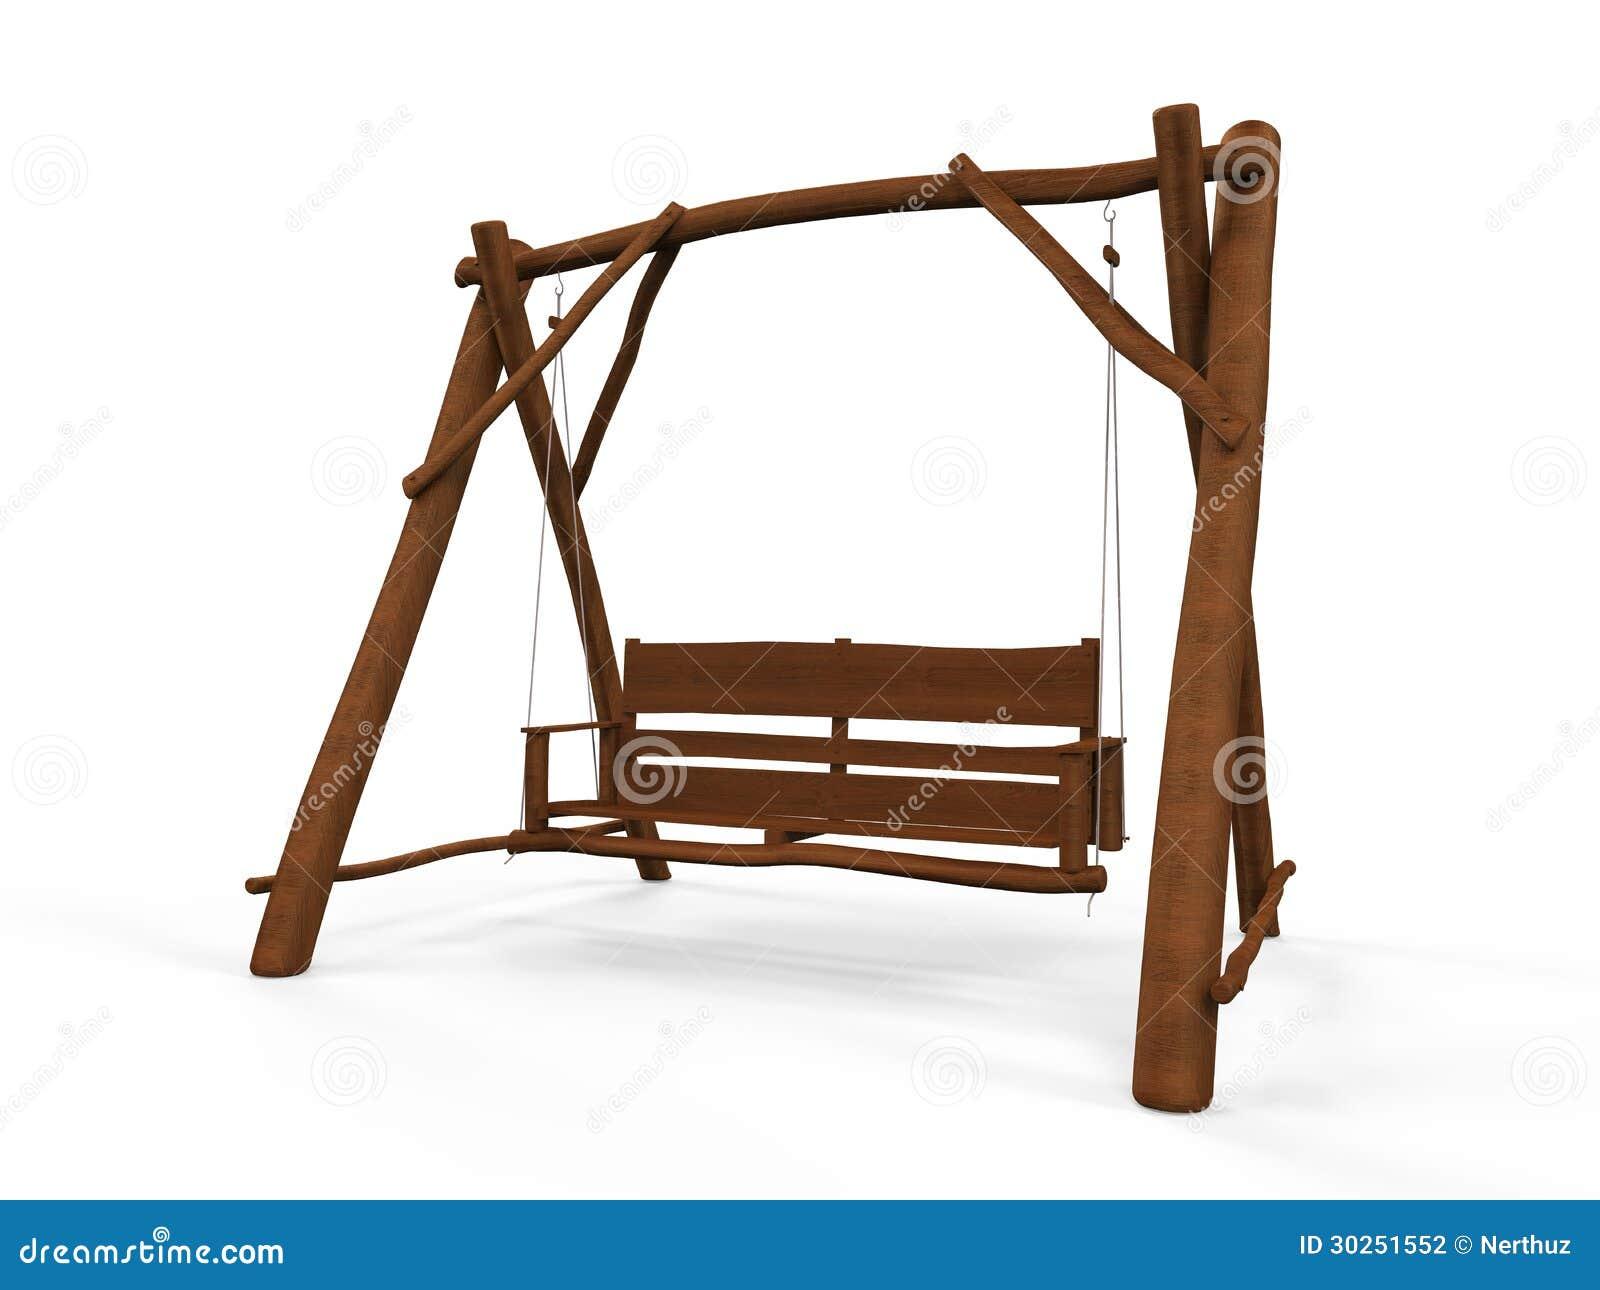 free deck storage bench plans woodworking plans furniture